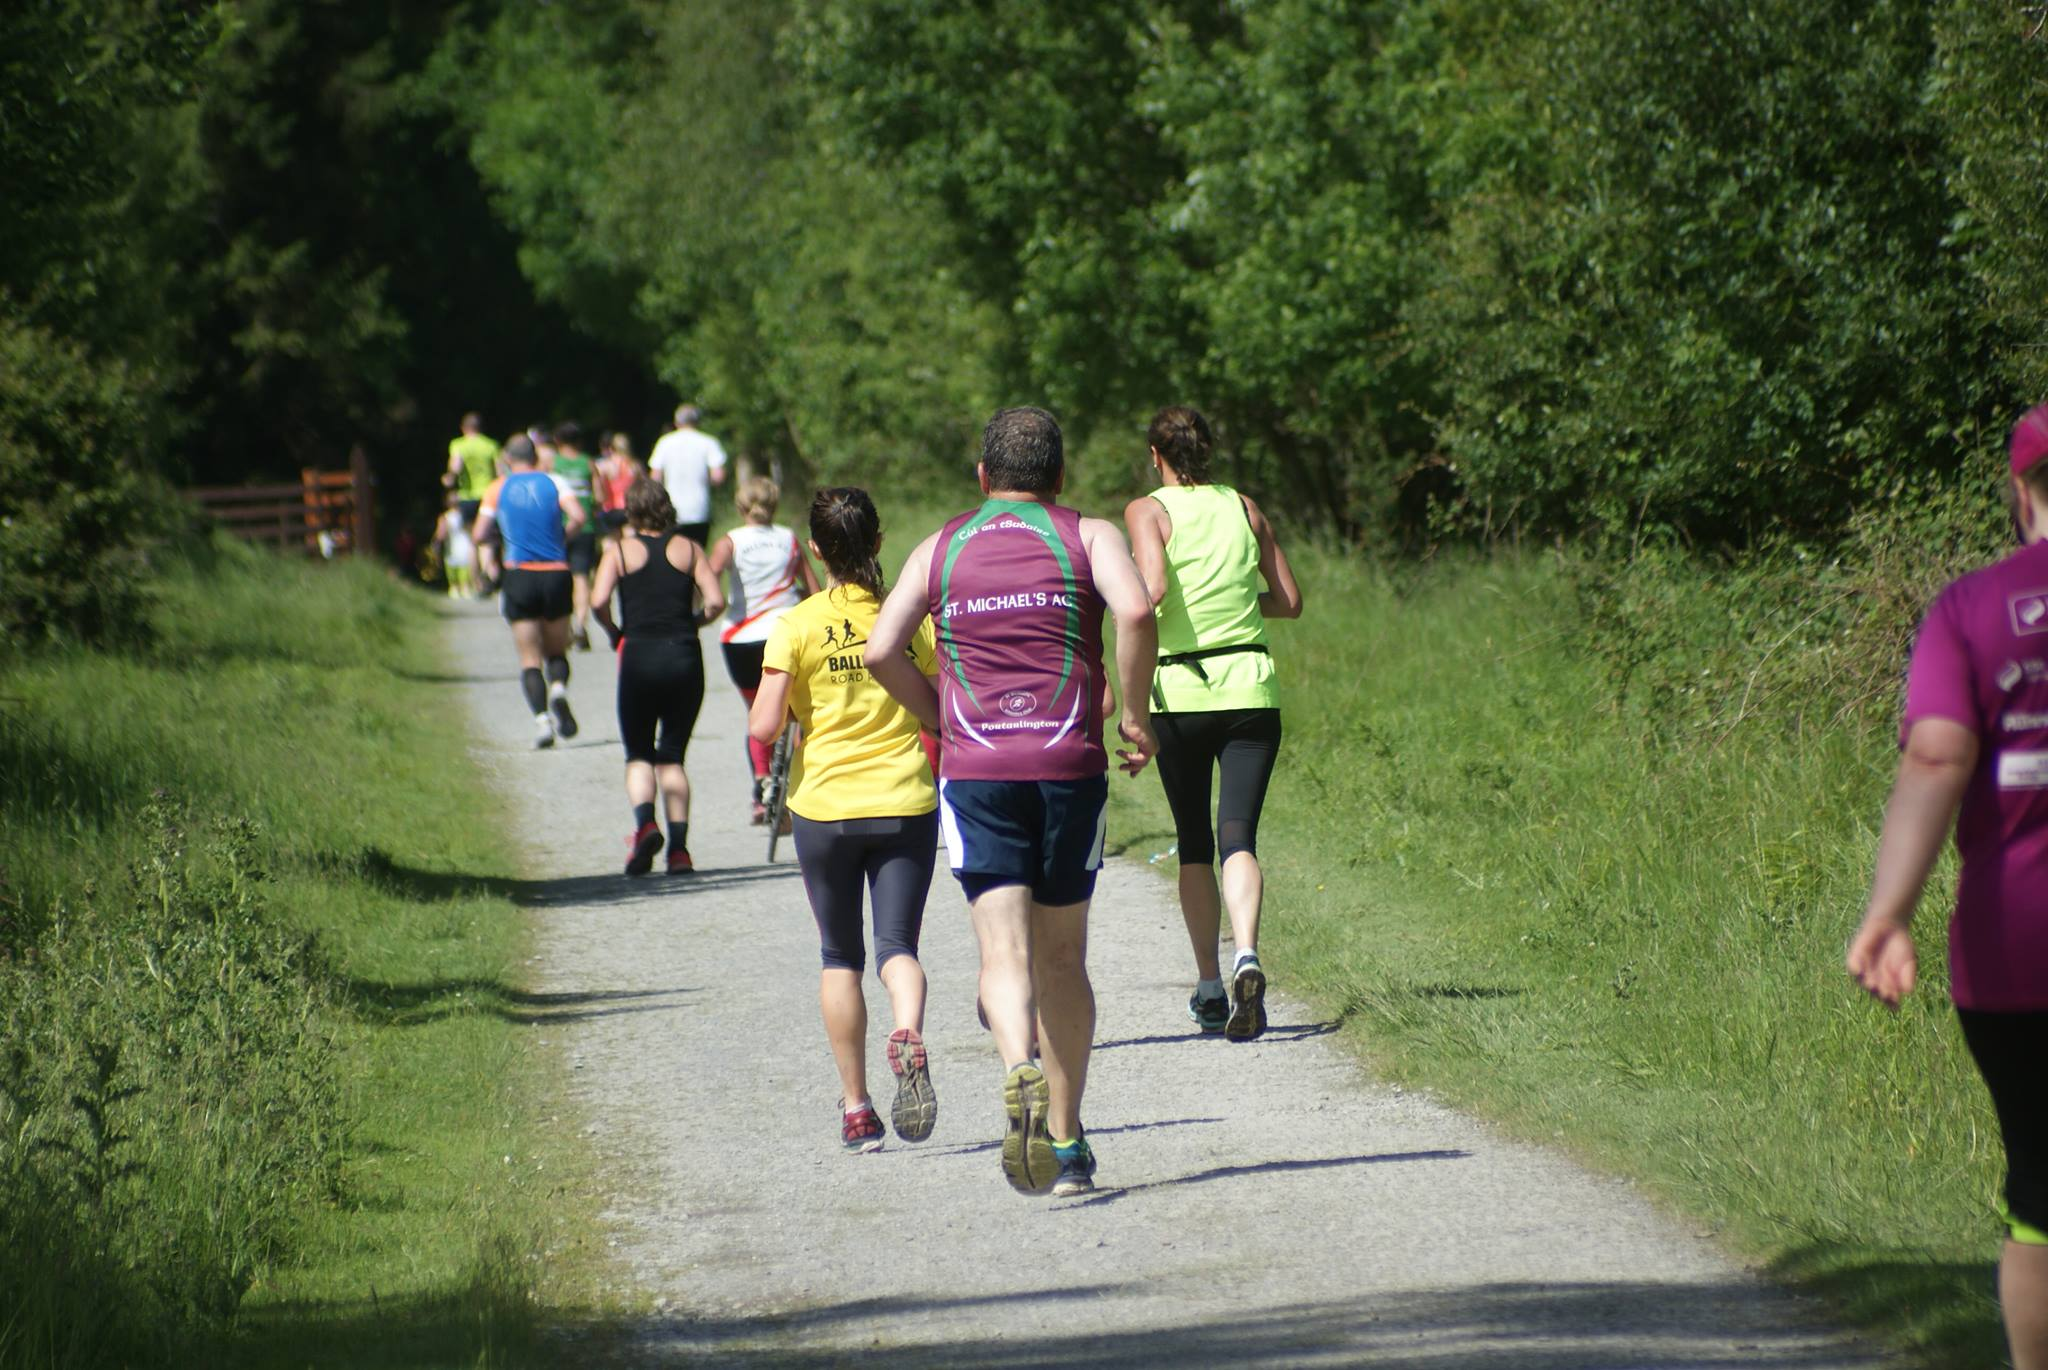 Forest and Moors Half Marathon & 10k